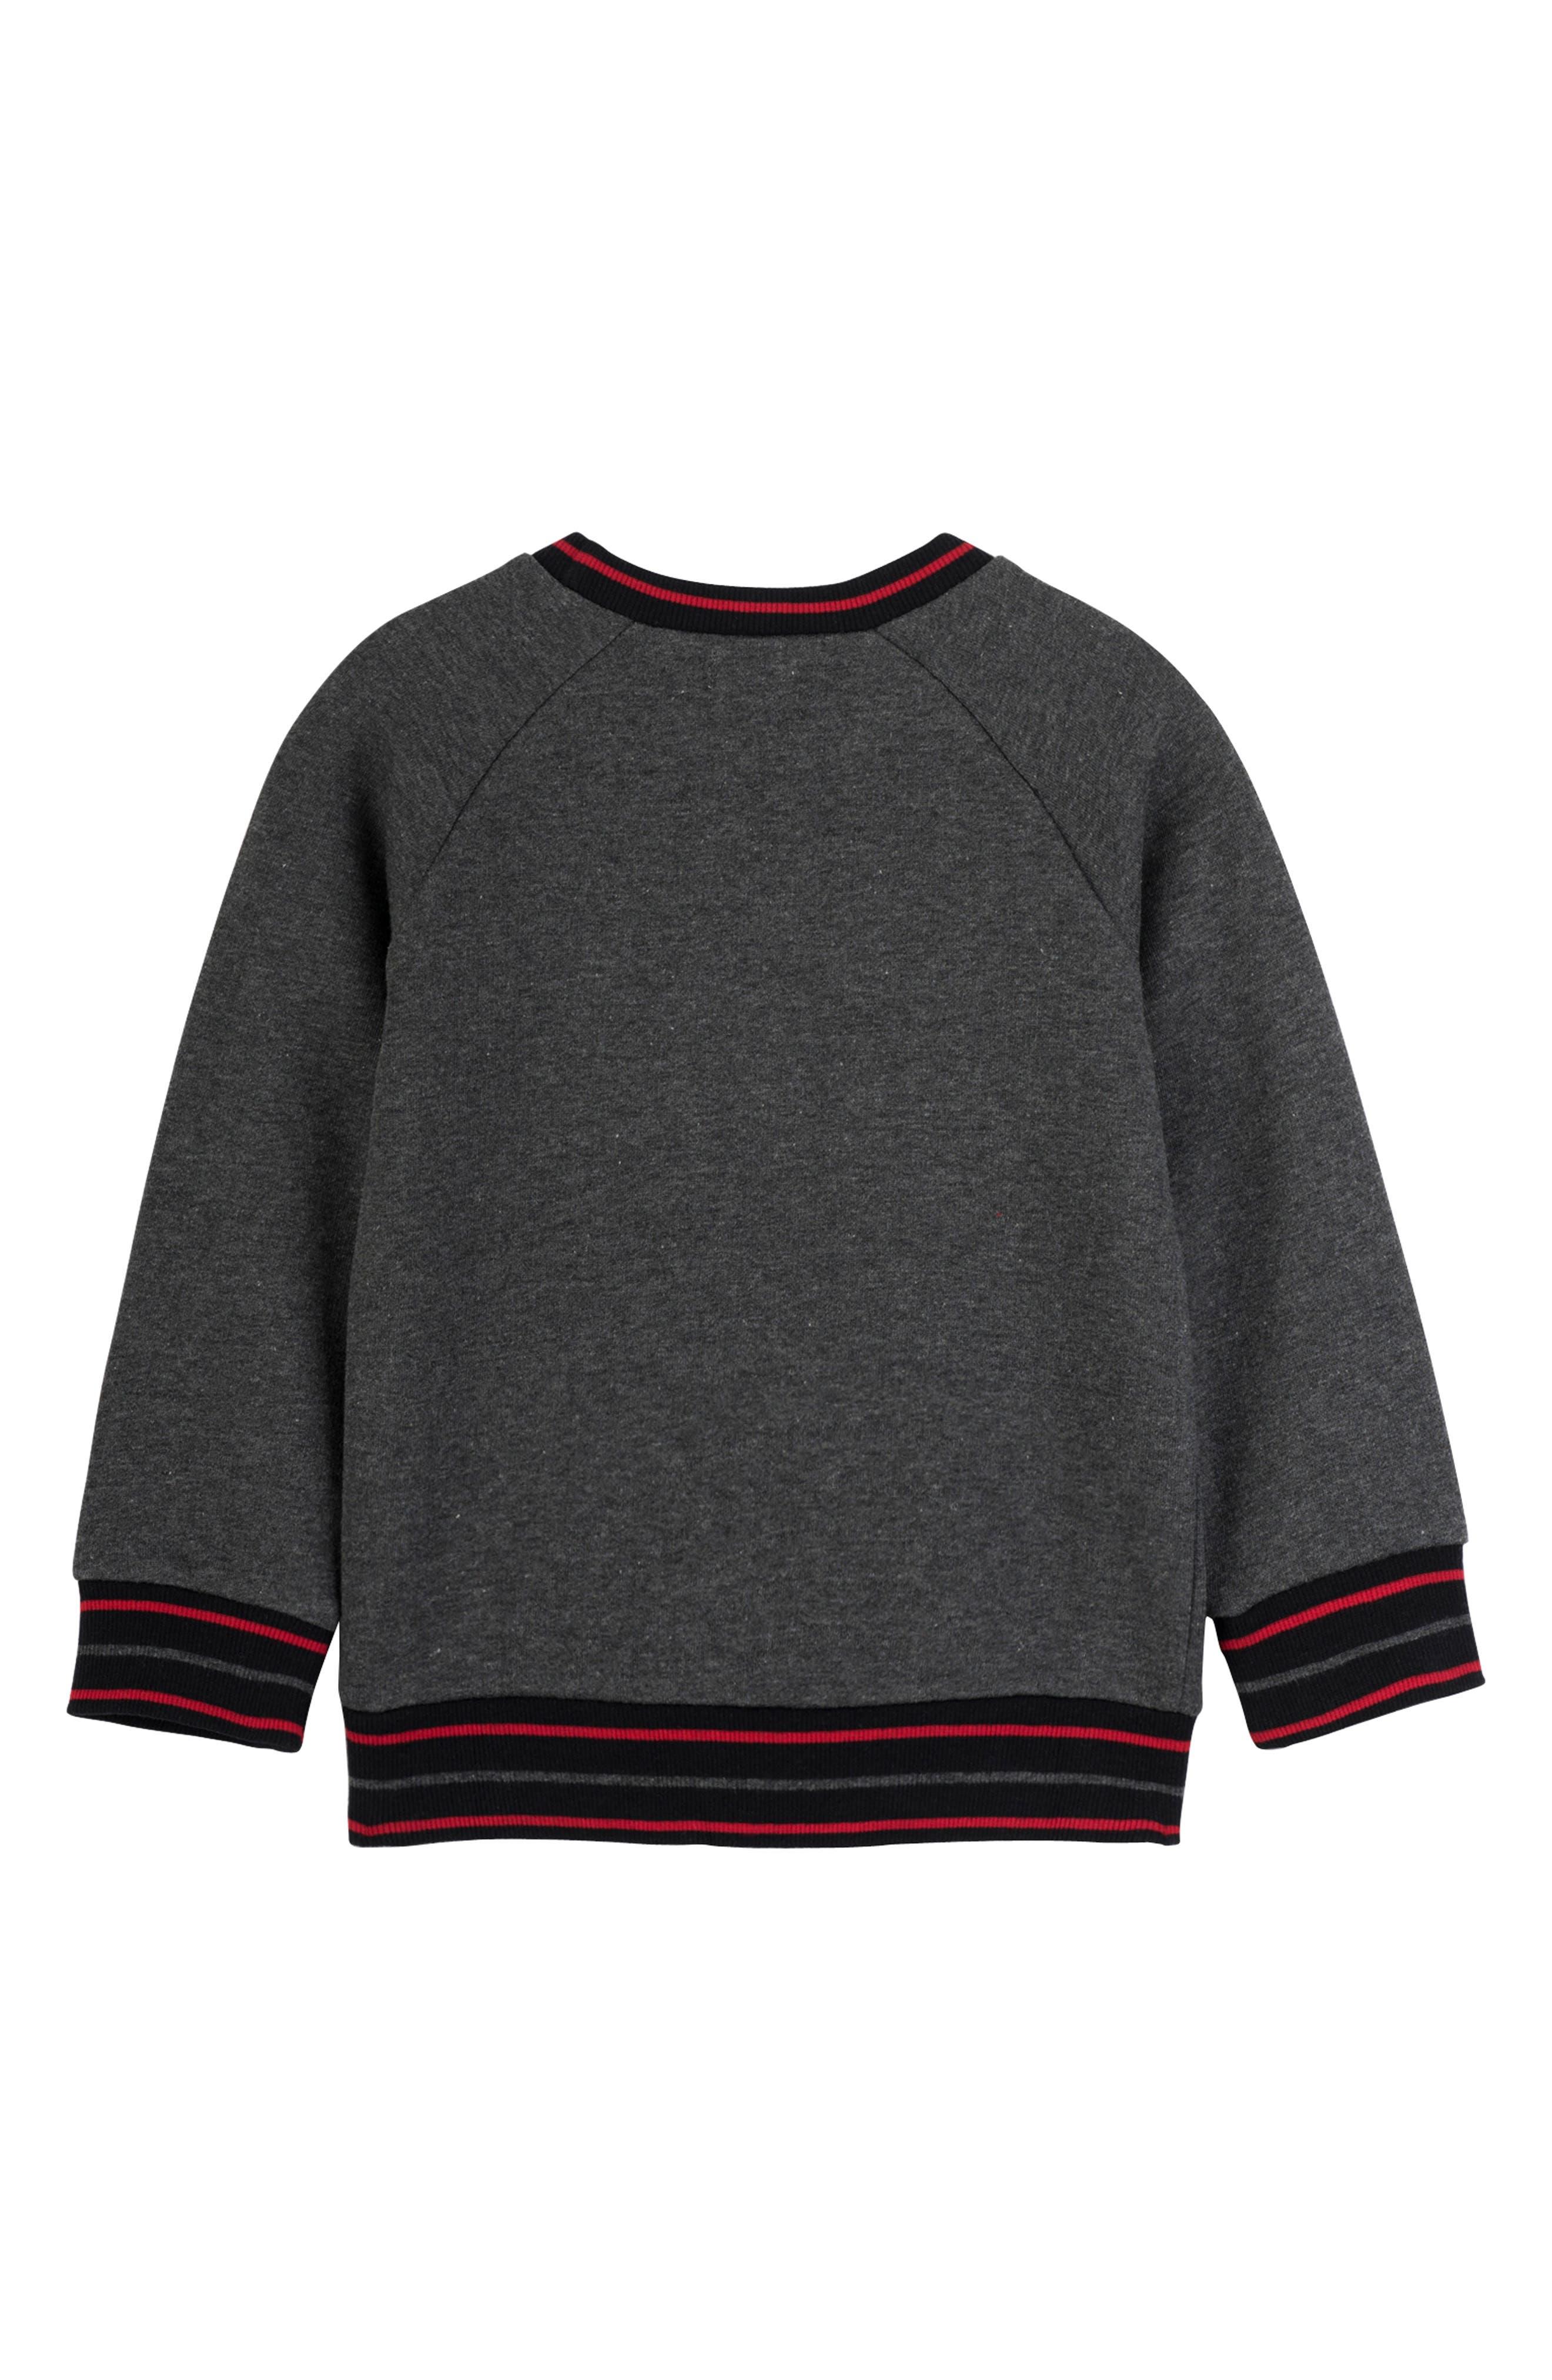 Bear Sweatshirt,                             Alternate thumbnail 2, color,                             BLACK BEAR